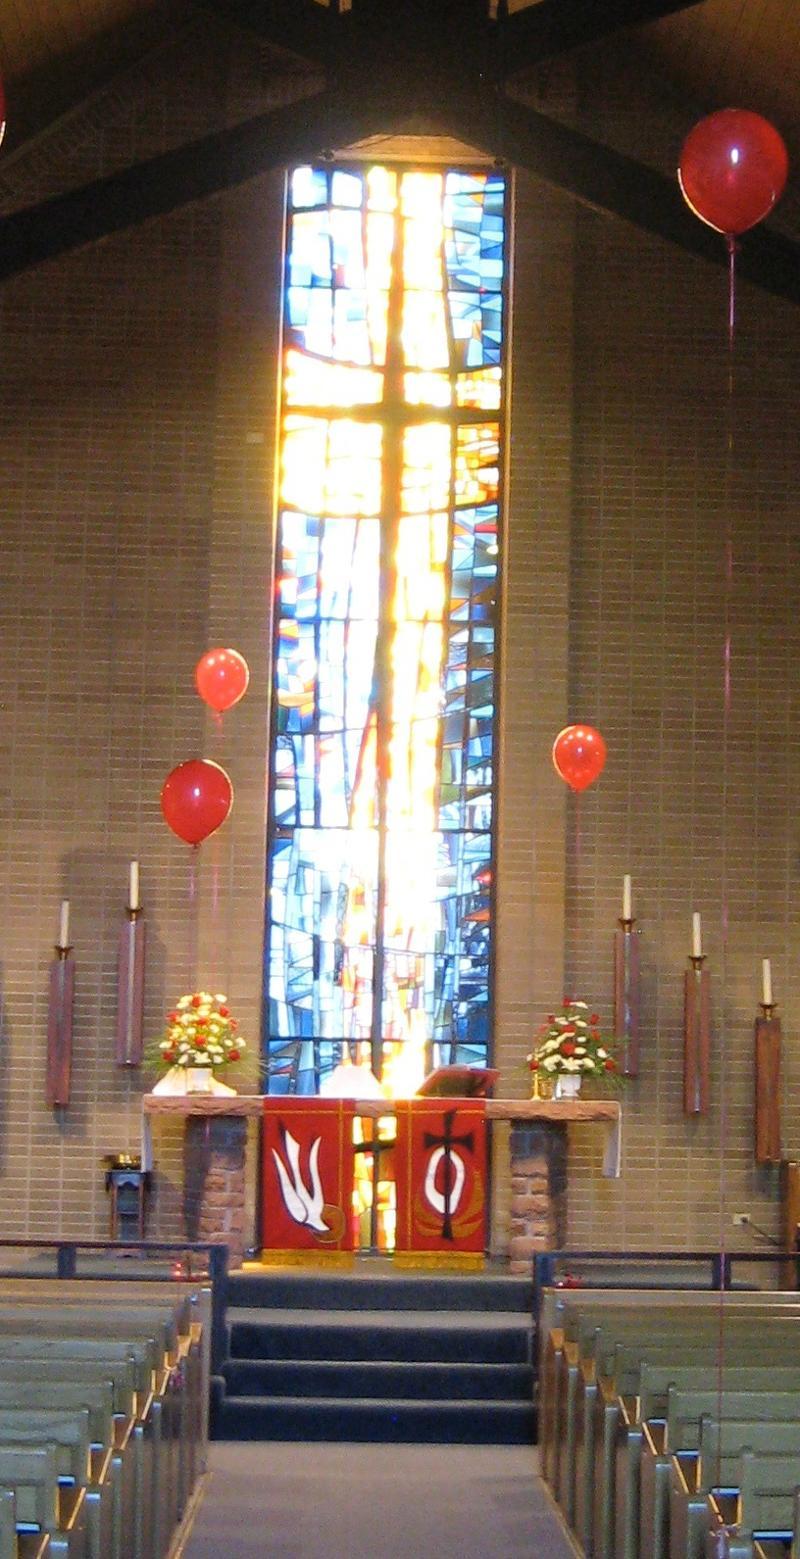 St. Makr's Aurora stained glass window